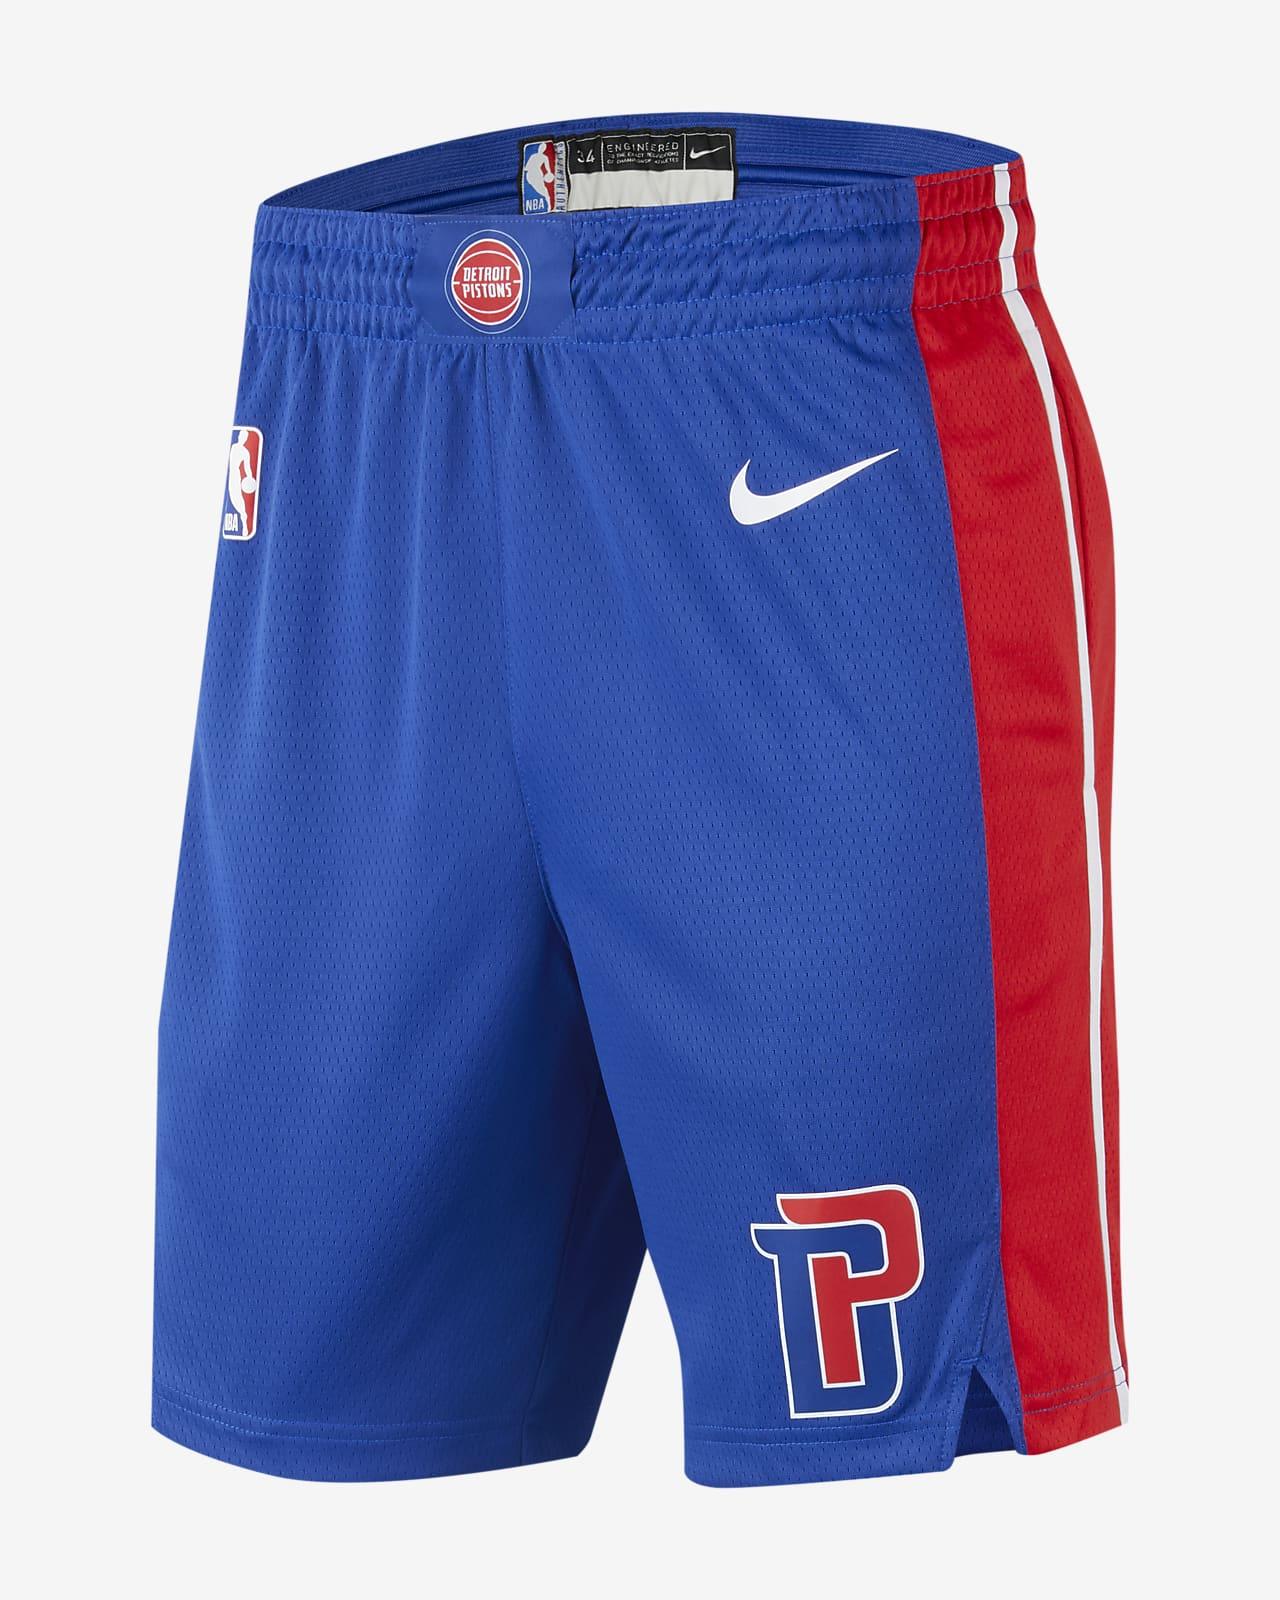 Detroit Pistons Icon Edition Men's Nike NBA Swingman Shorts